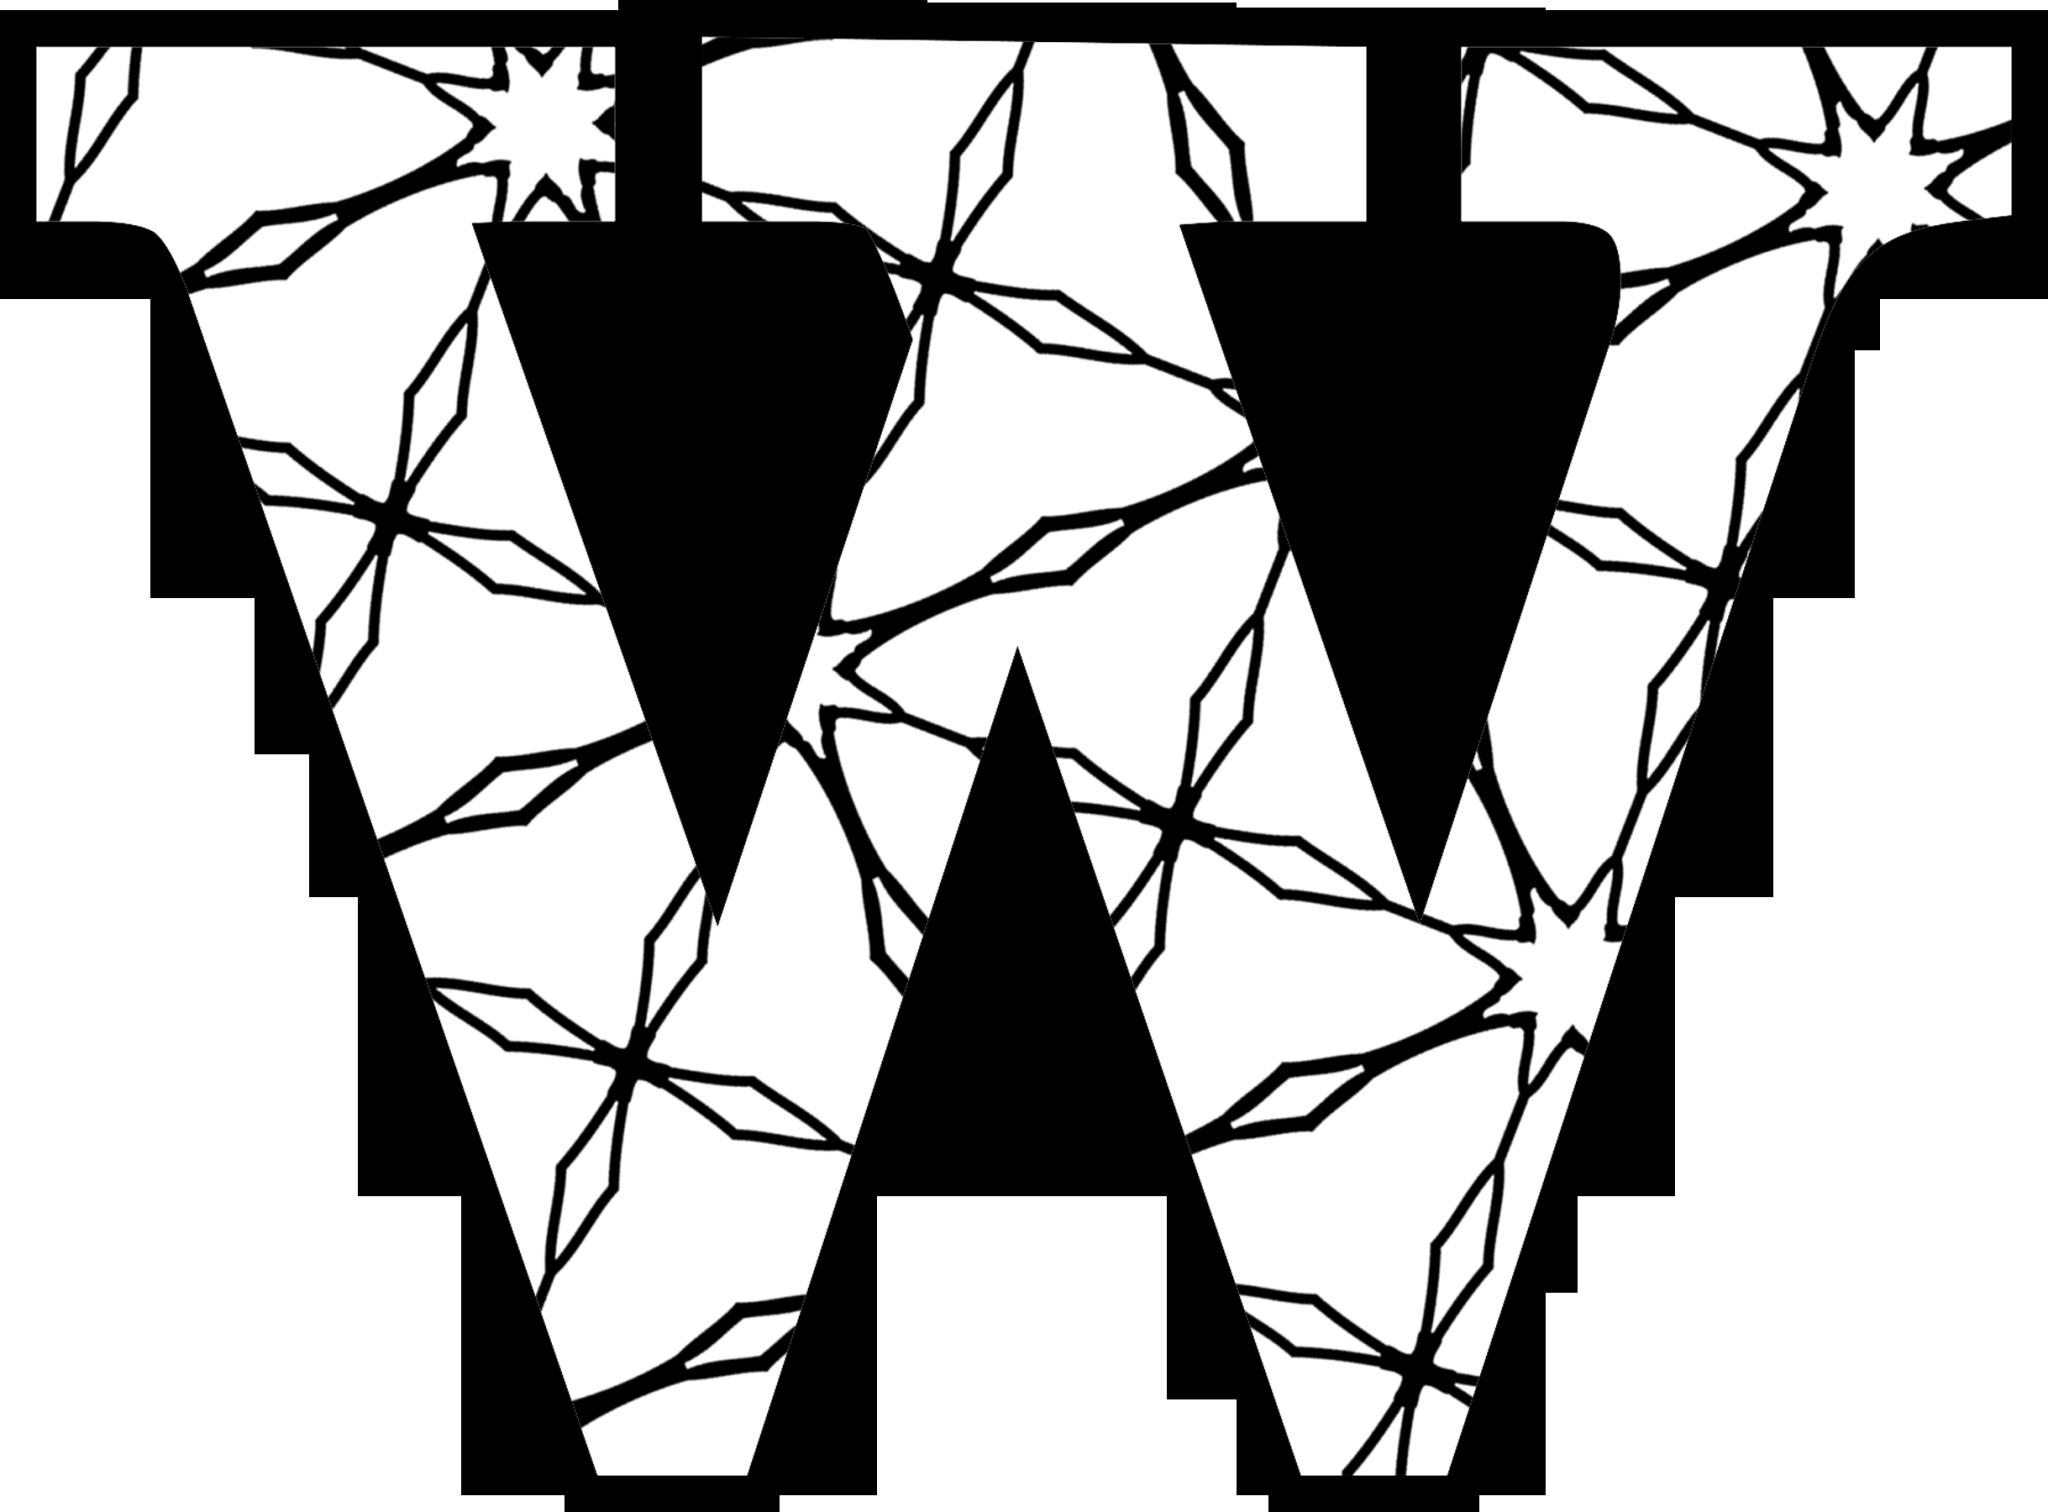 W Awaywiththepixels 2 048 1 512 Pixels